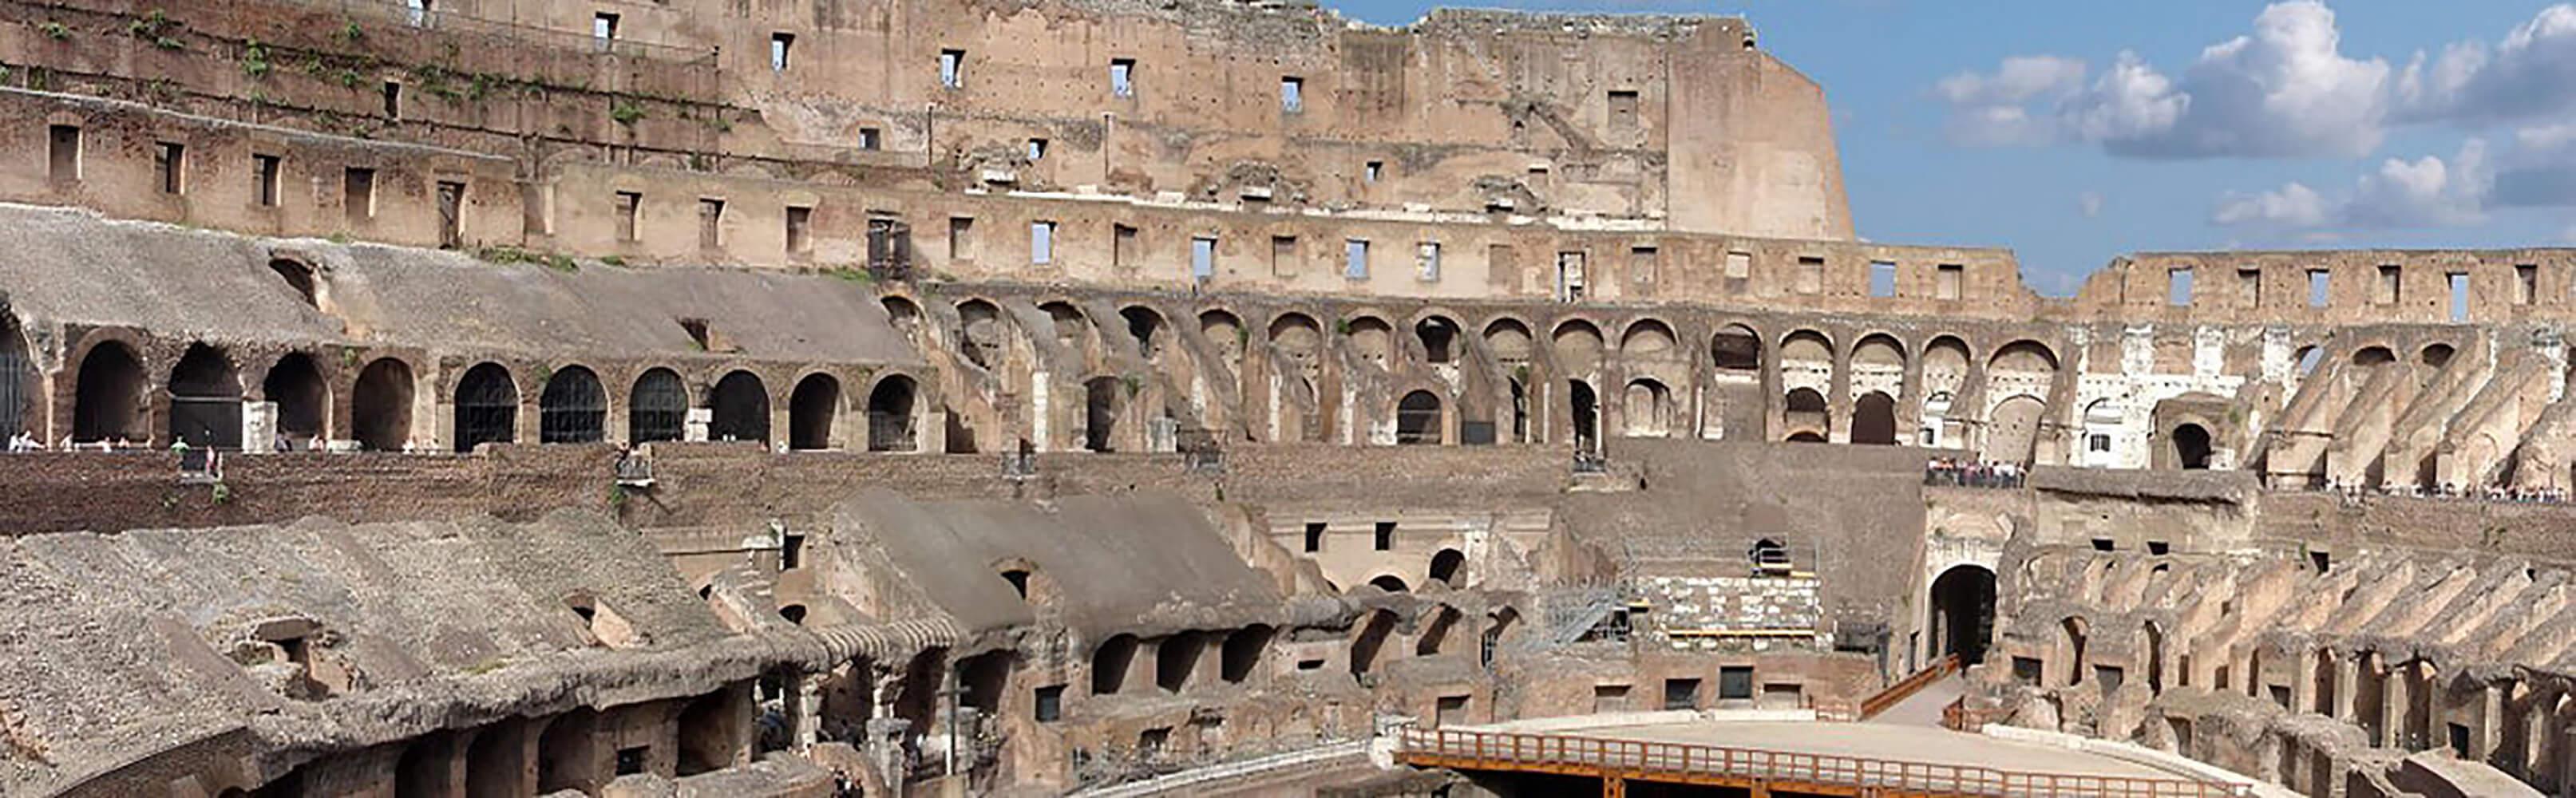 Kolosseum 1